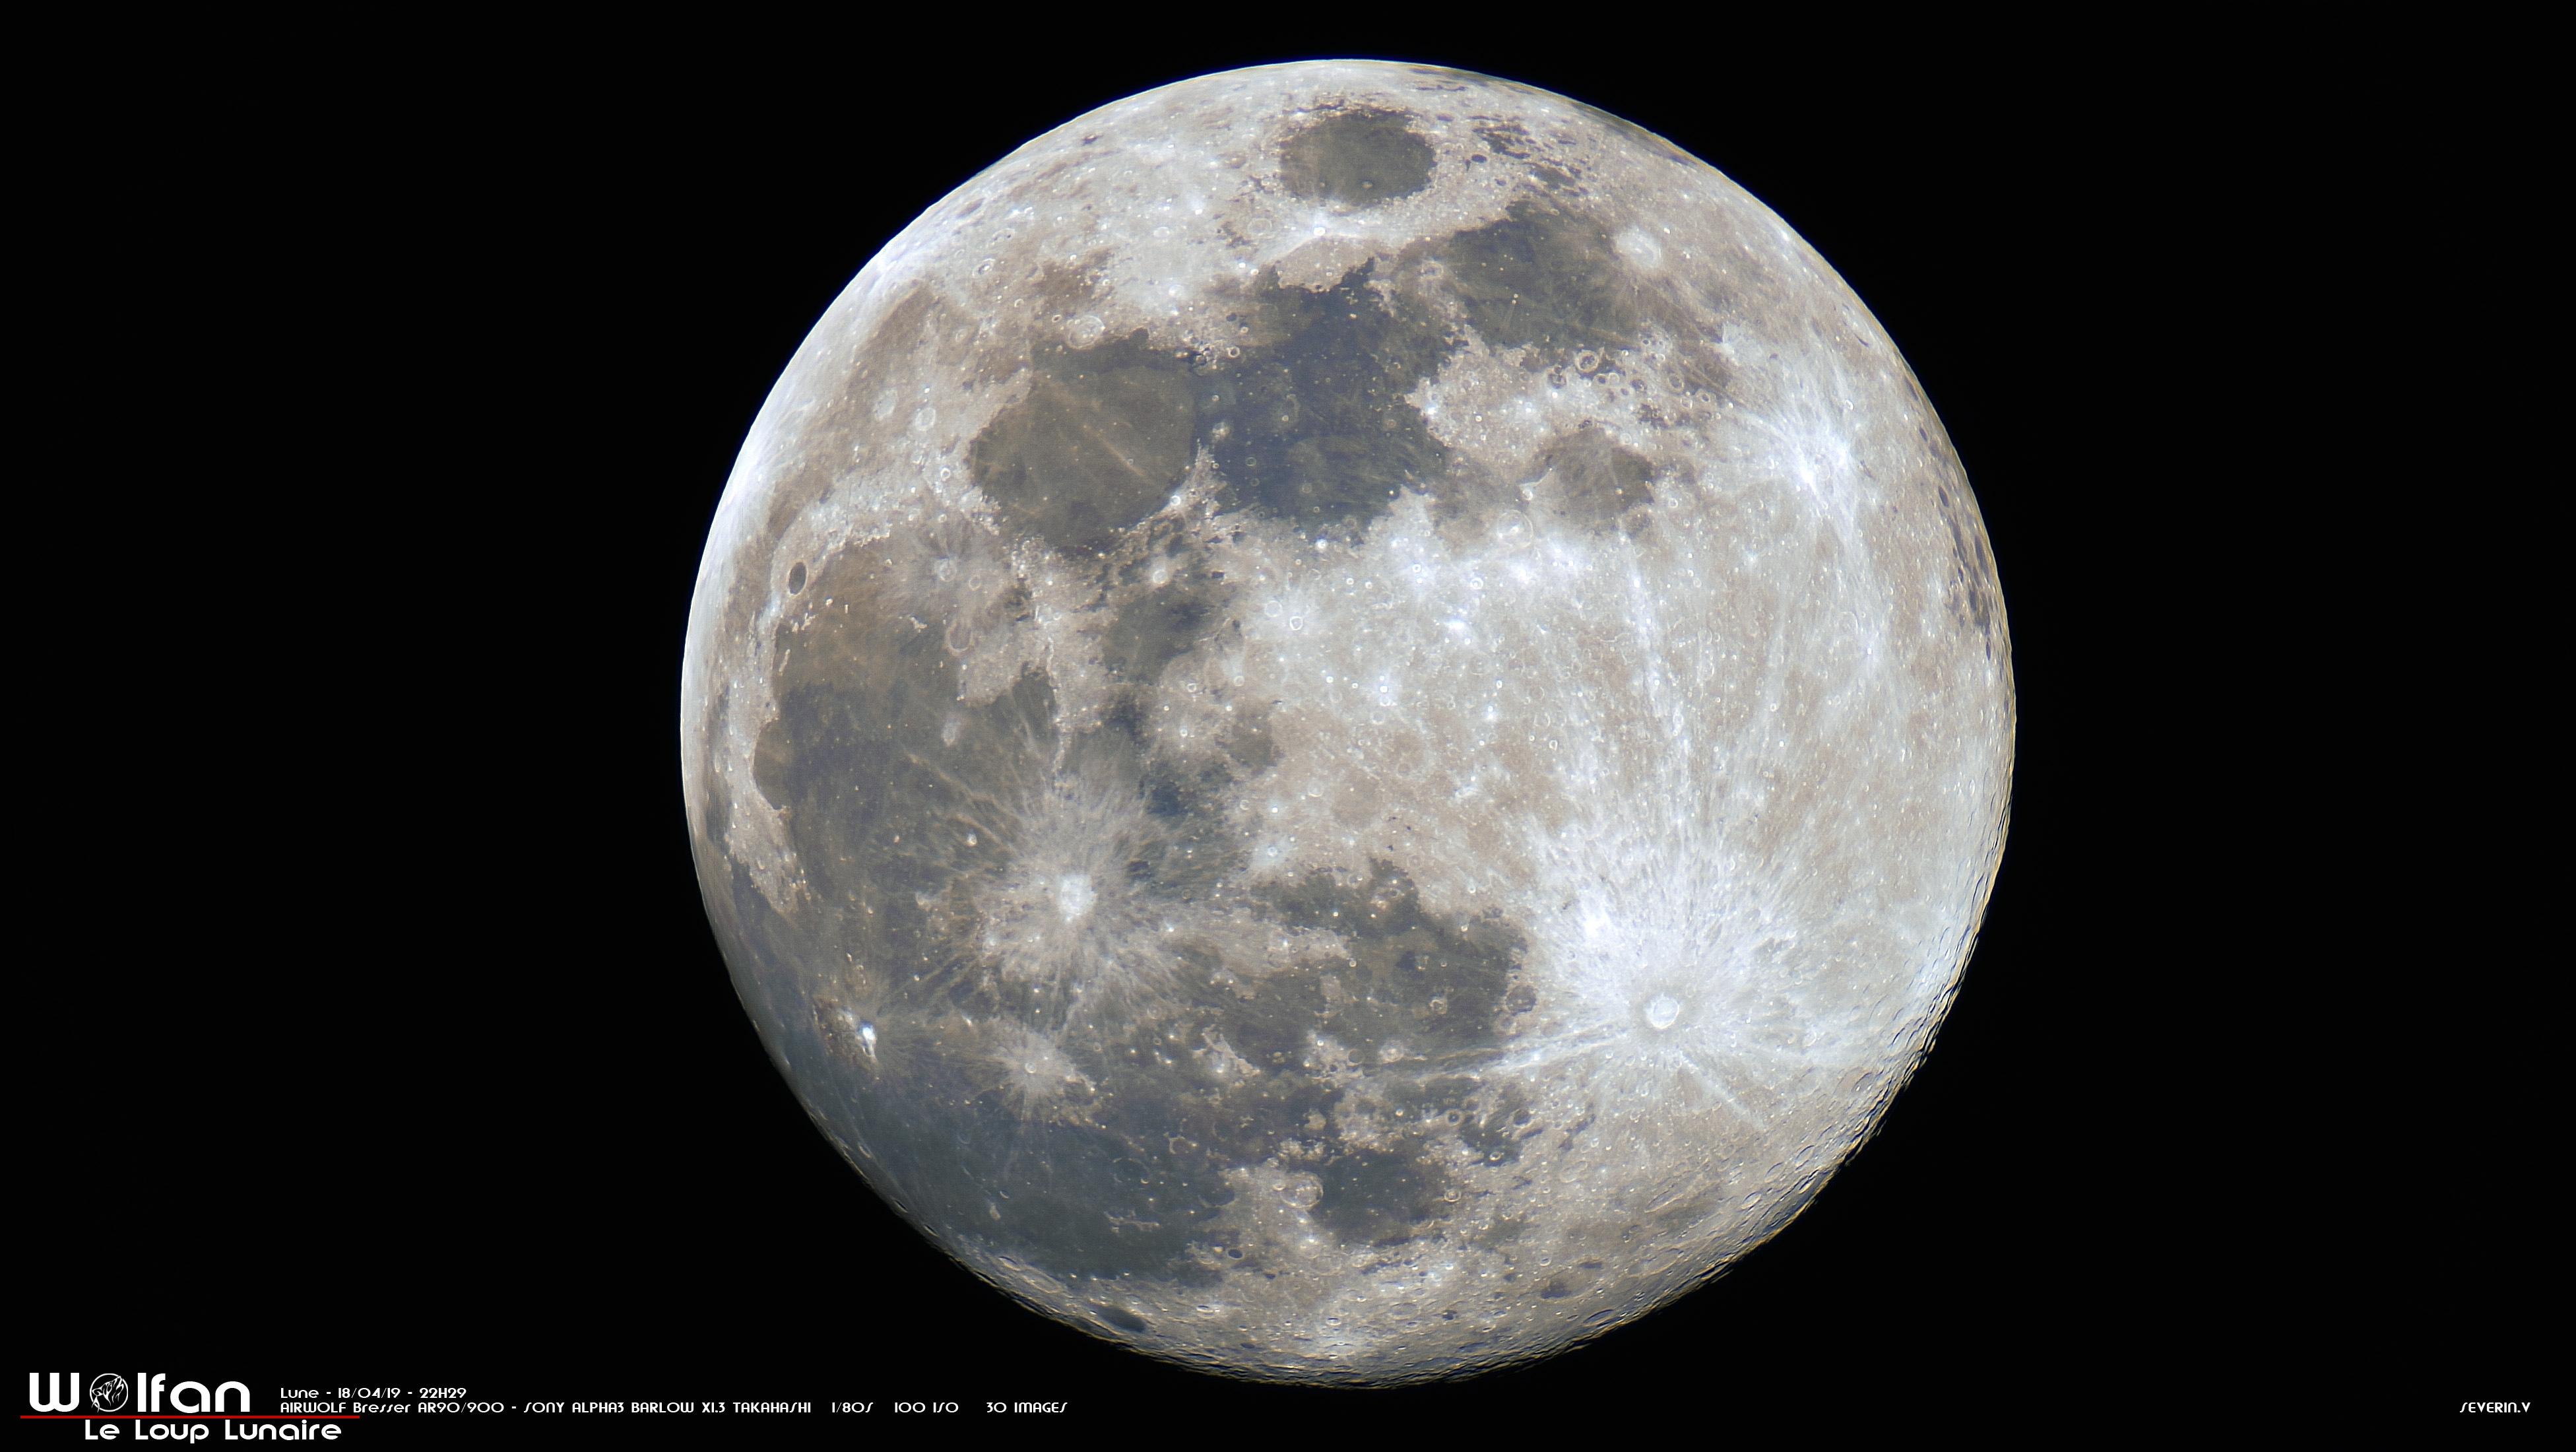 large.5cba15a3972d4_Moon_lapl4_ap3872copie.jpg.e36d9c52ae88ba711fc88d2094fdc94e.jpg